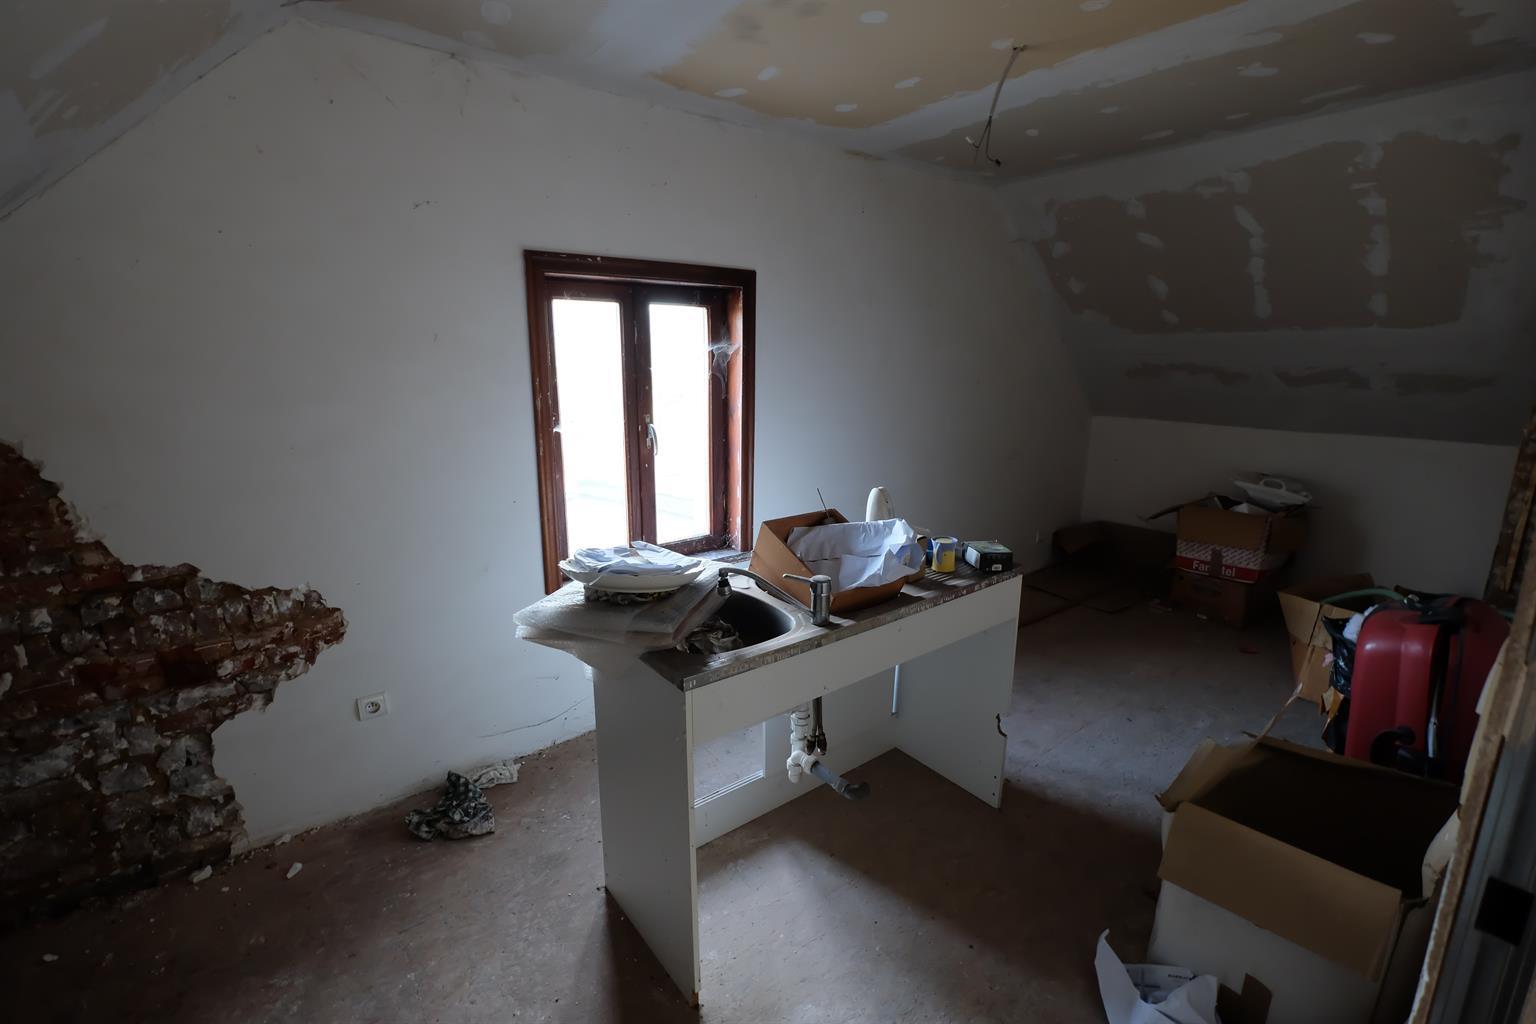 Maison - Tubize Oisquercq - #4398600-4